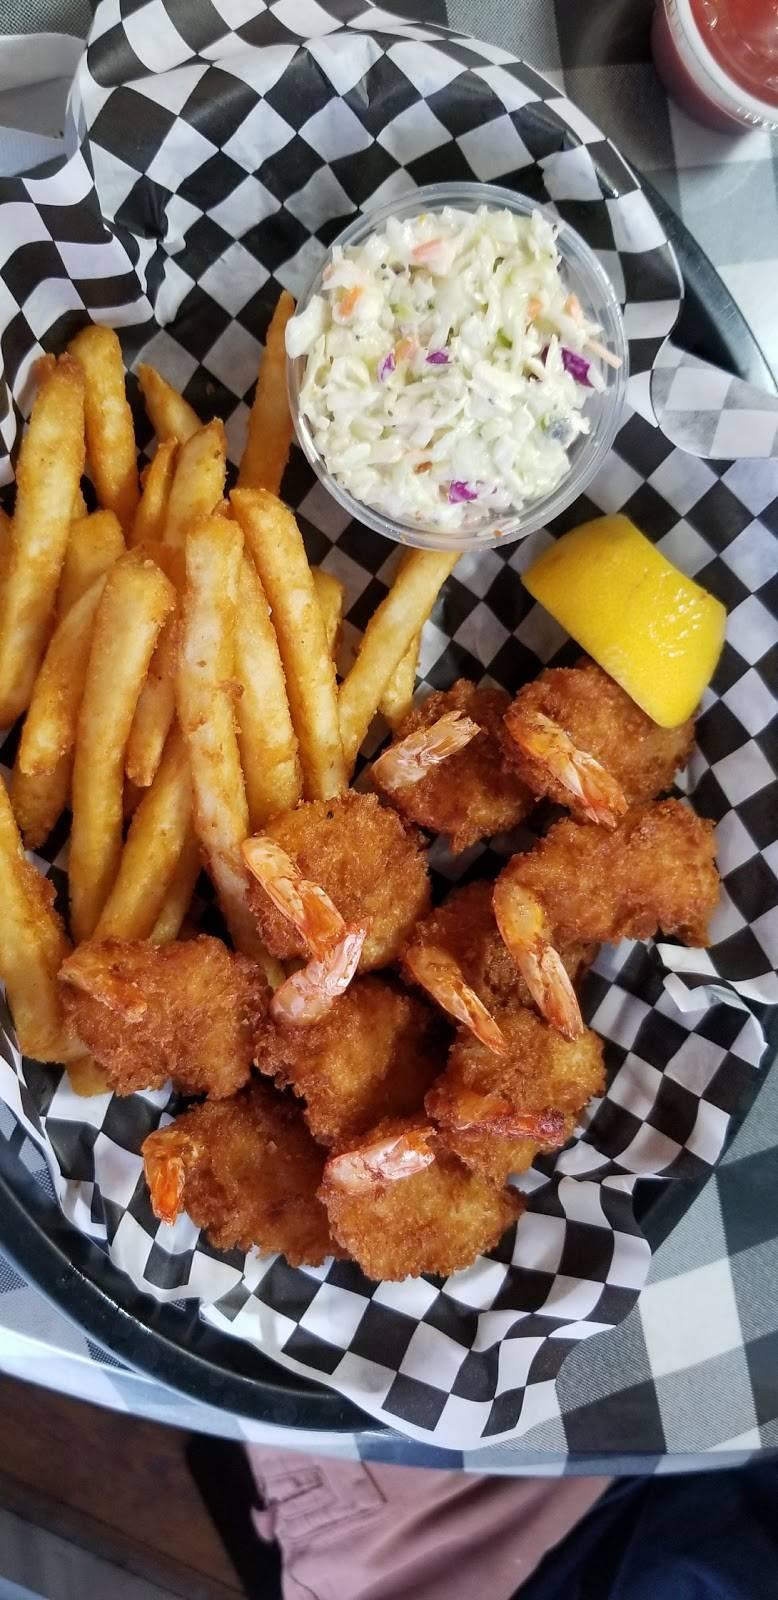 The Fish Guy | restaurant | 4114 Grand Blvd, New Port Richey, FL 34652, USA | 7272648818 OR +1 727-264-8818